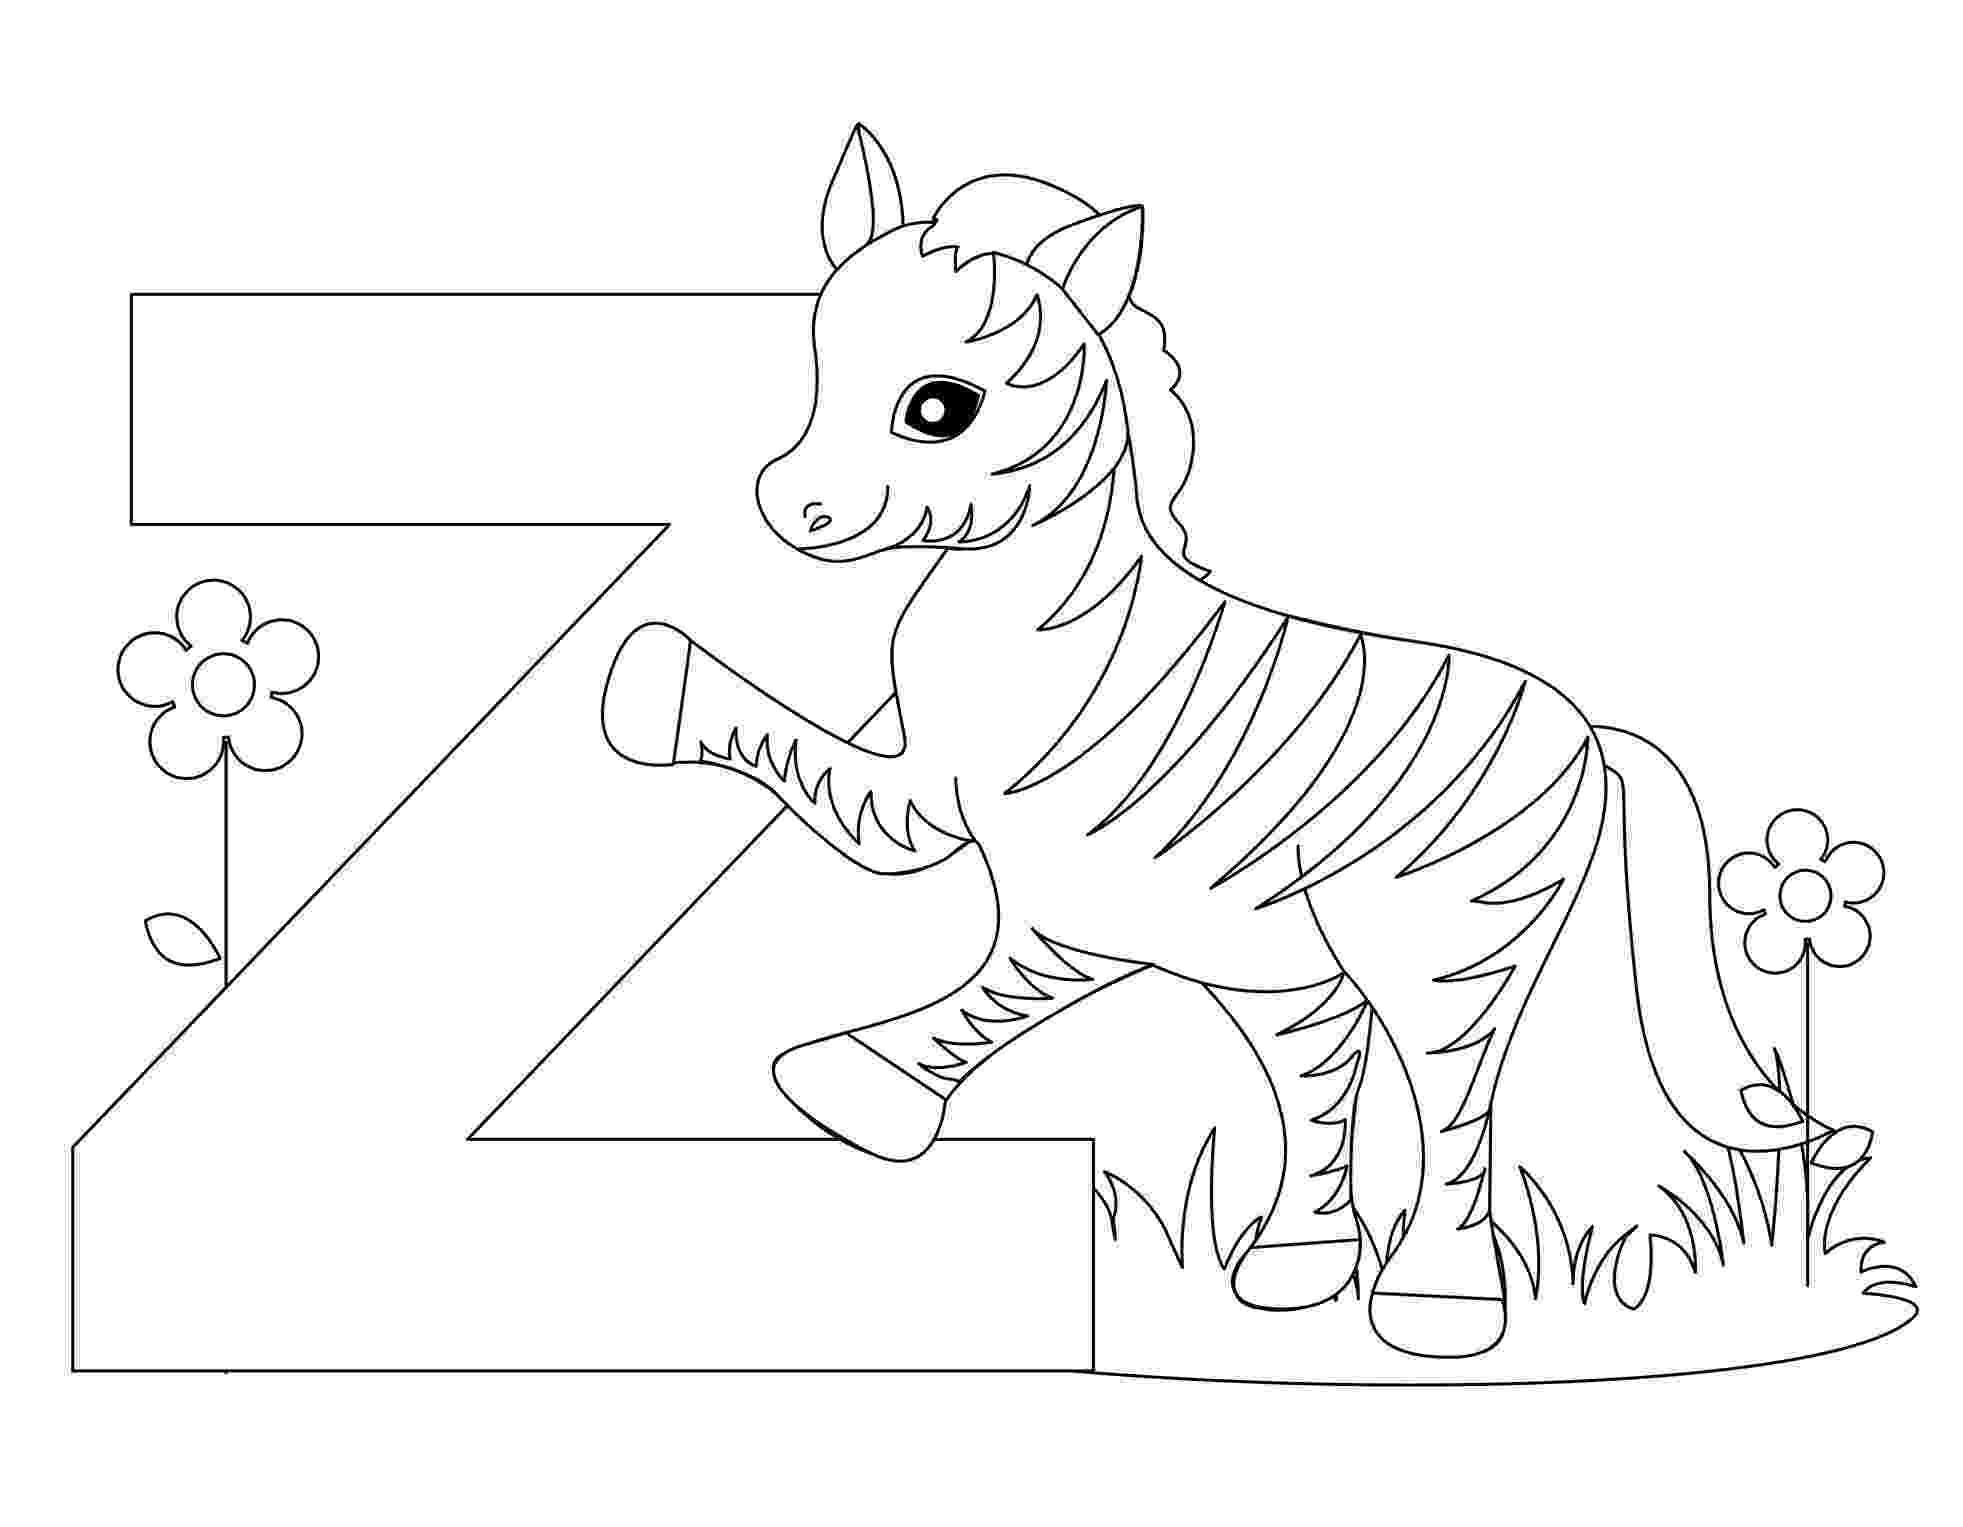 alphabet coloring worksheets free printable alphabet coloring pages for kids best coloring alphabet worksheets 1 5